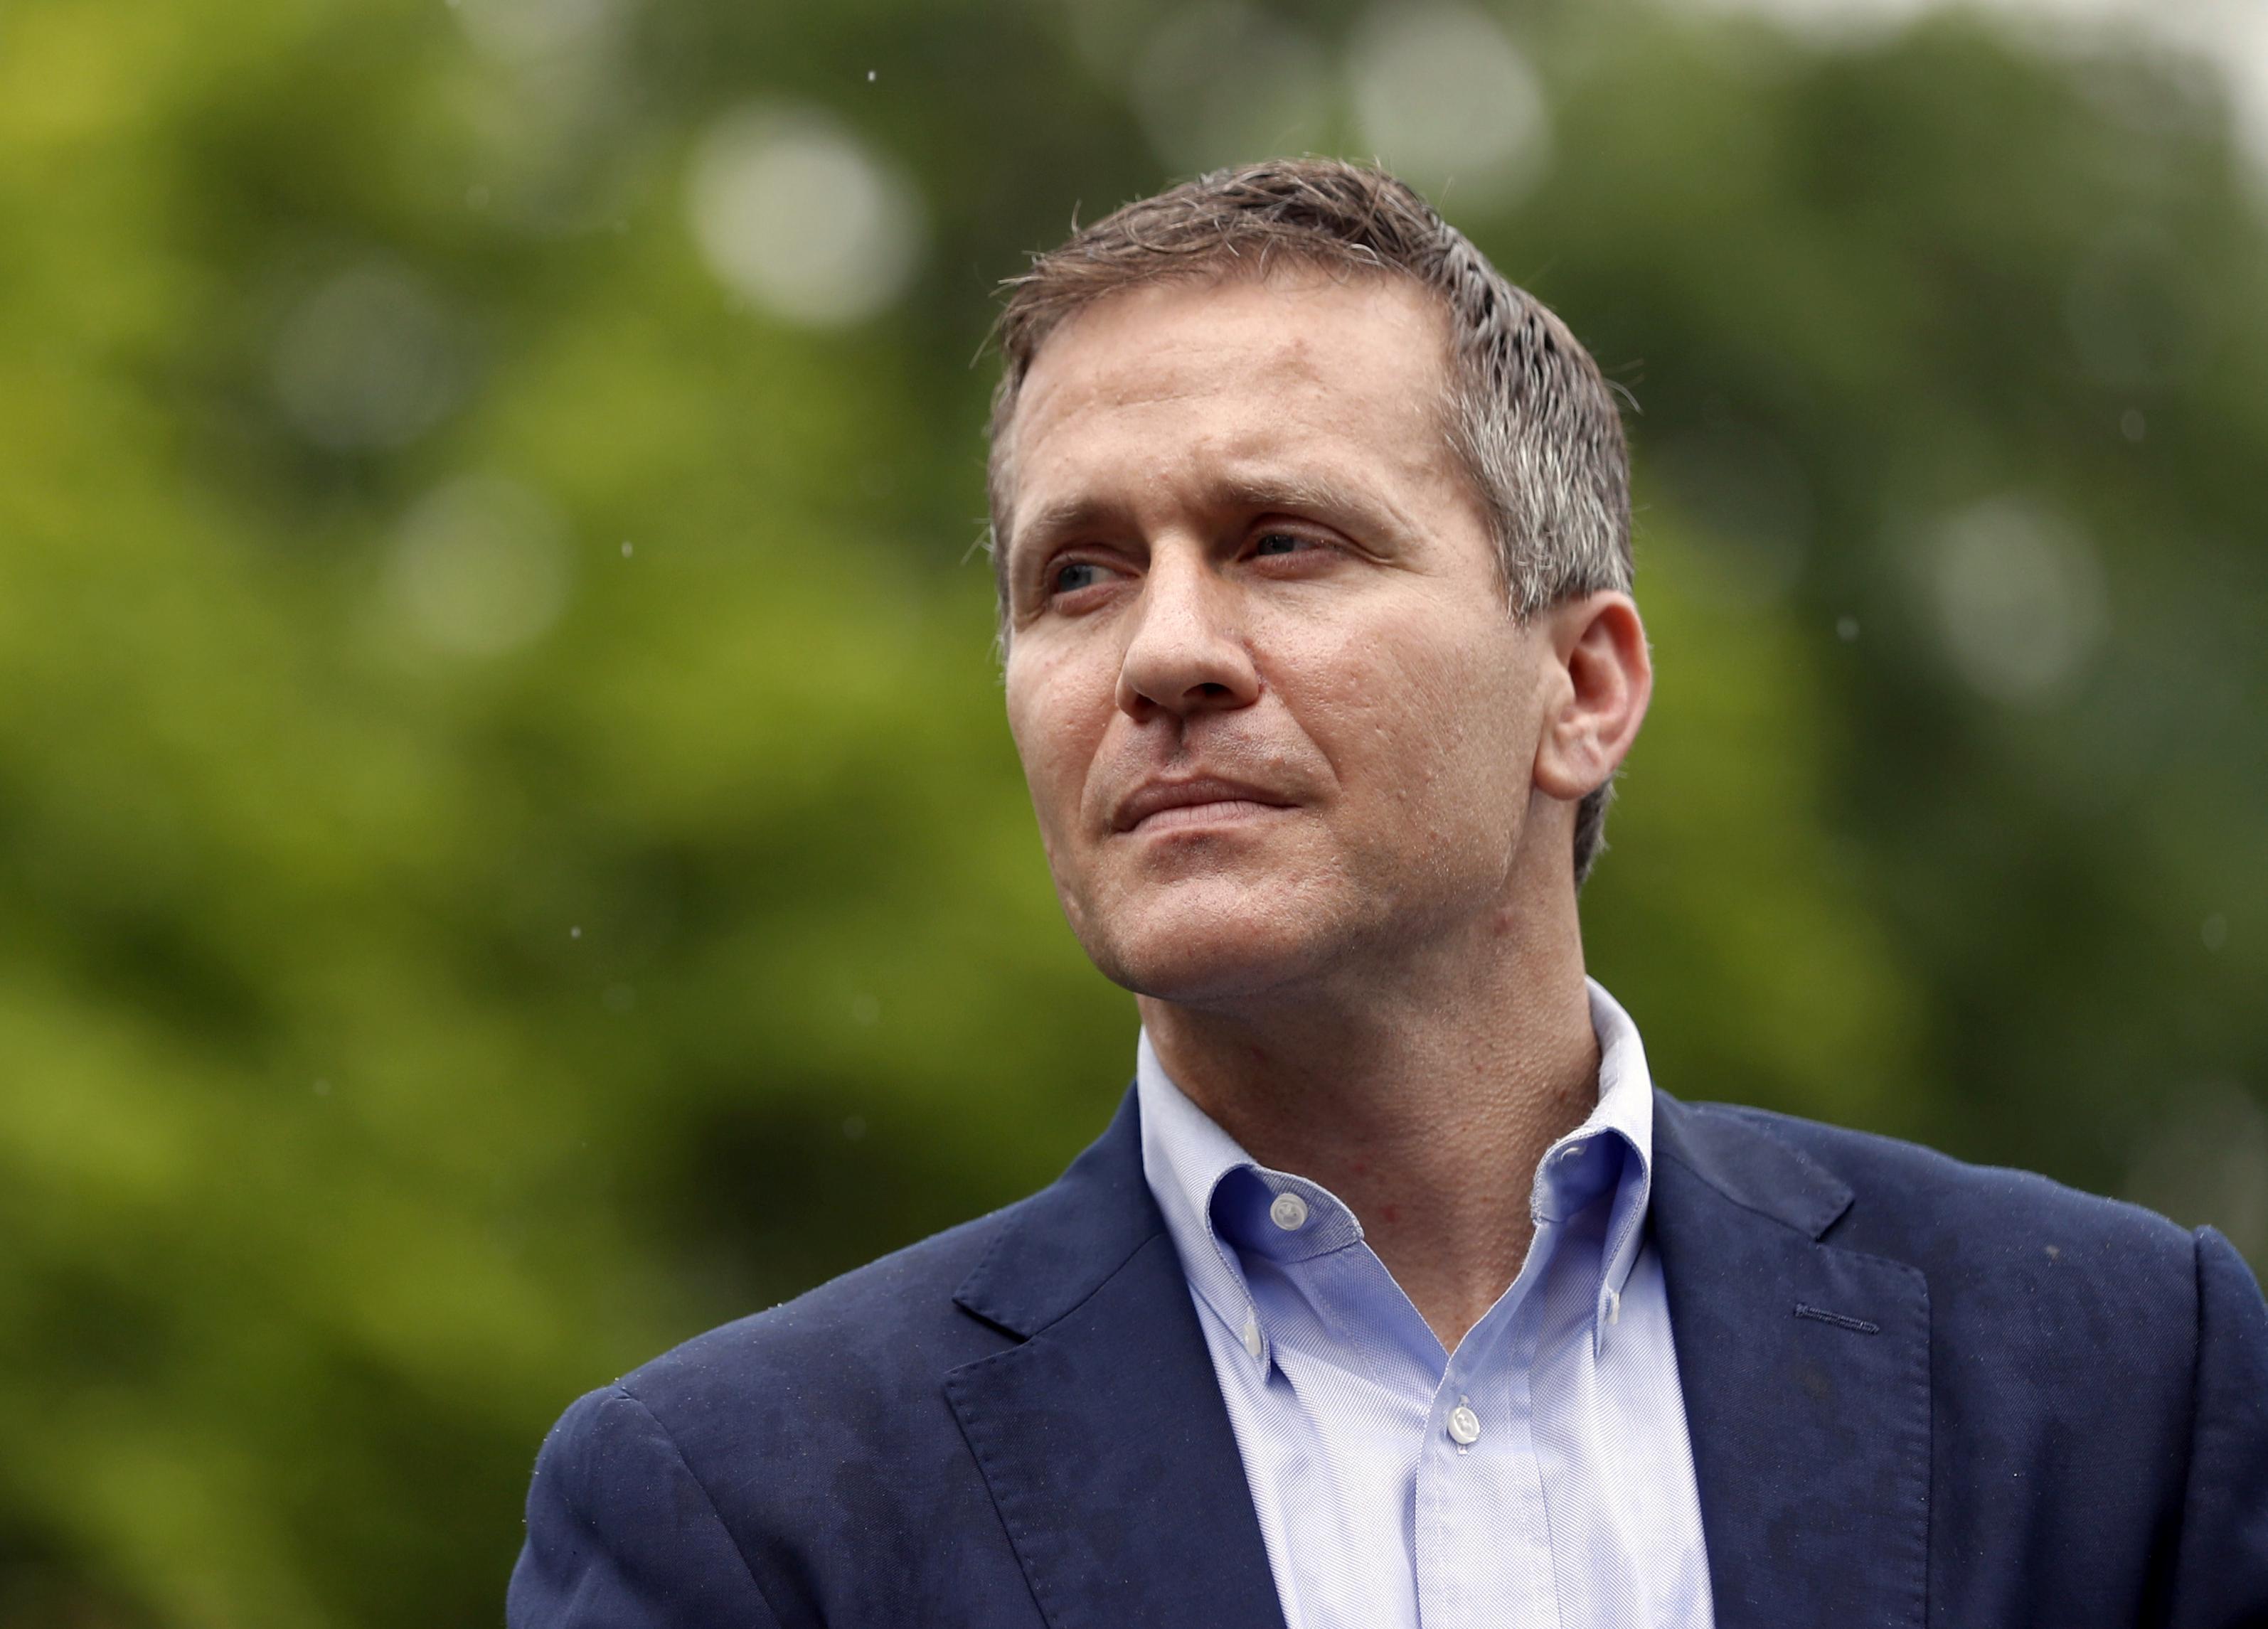 Missouri Gov  Eric Greitens resigns amid widening